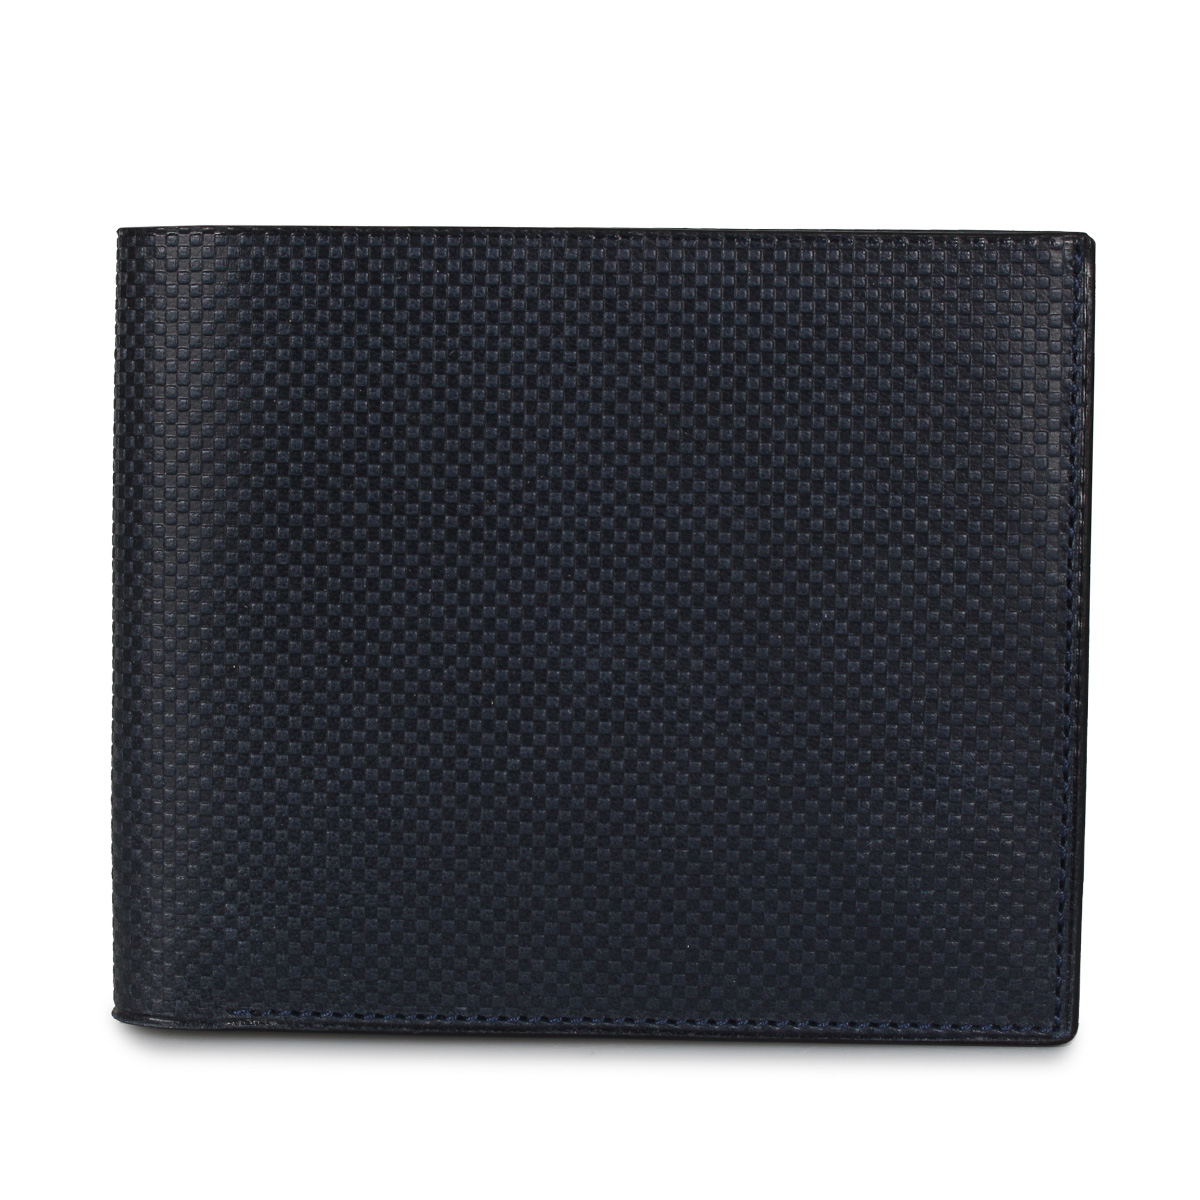 HIROAN CROISE ヒロアン 財布 二つ折り メンズ 博庵 ブラック ネイビー 黒 HM-80127 [6/5 新入荷]